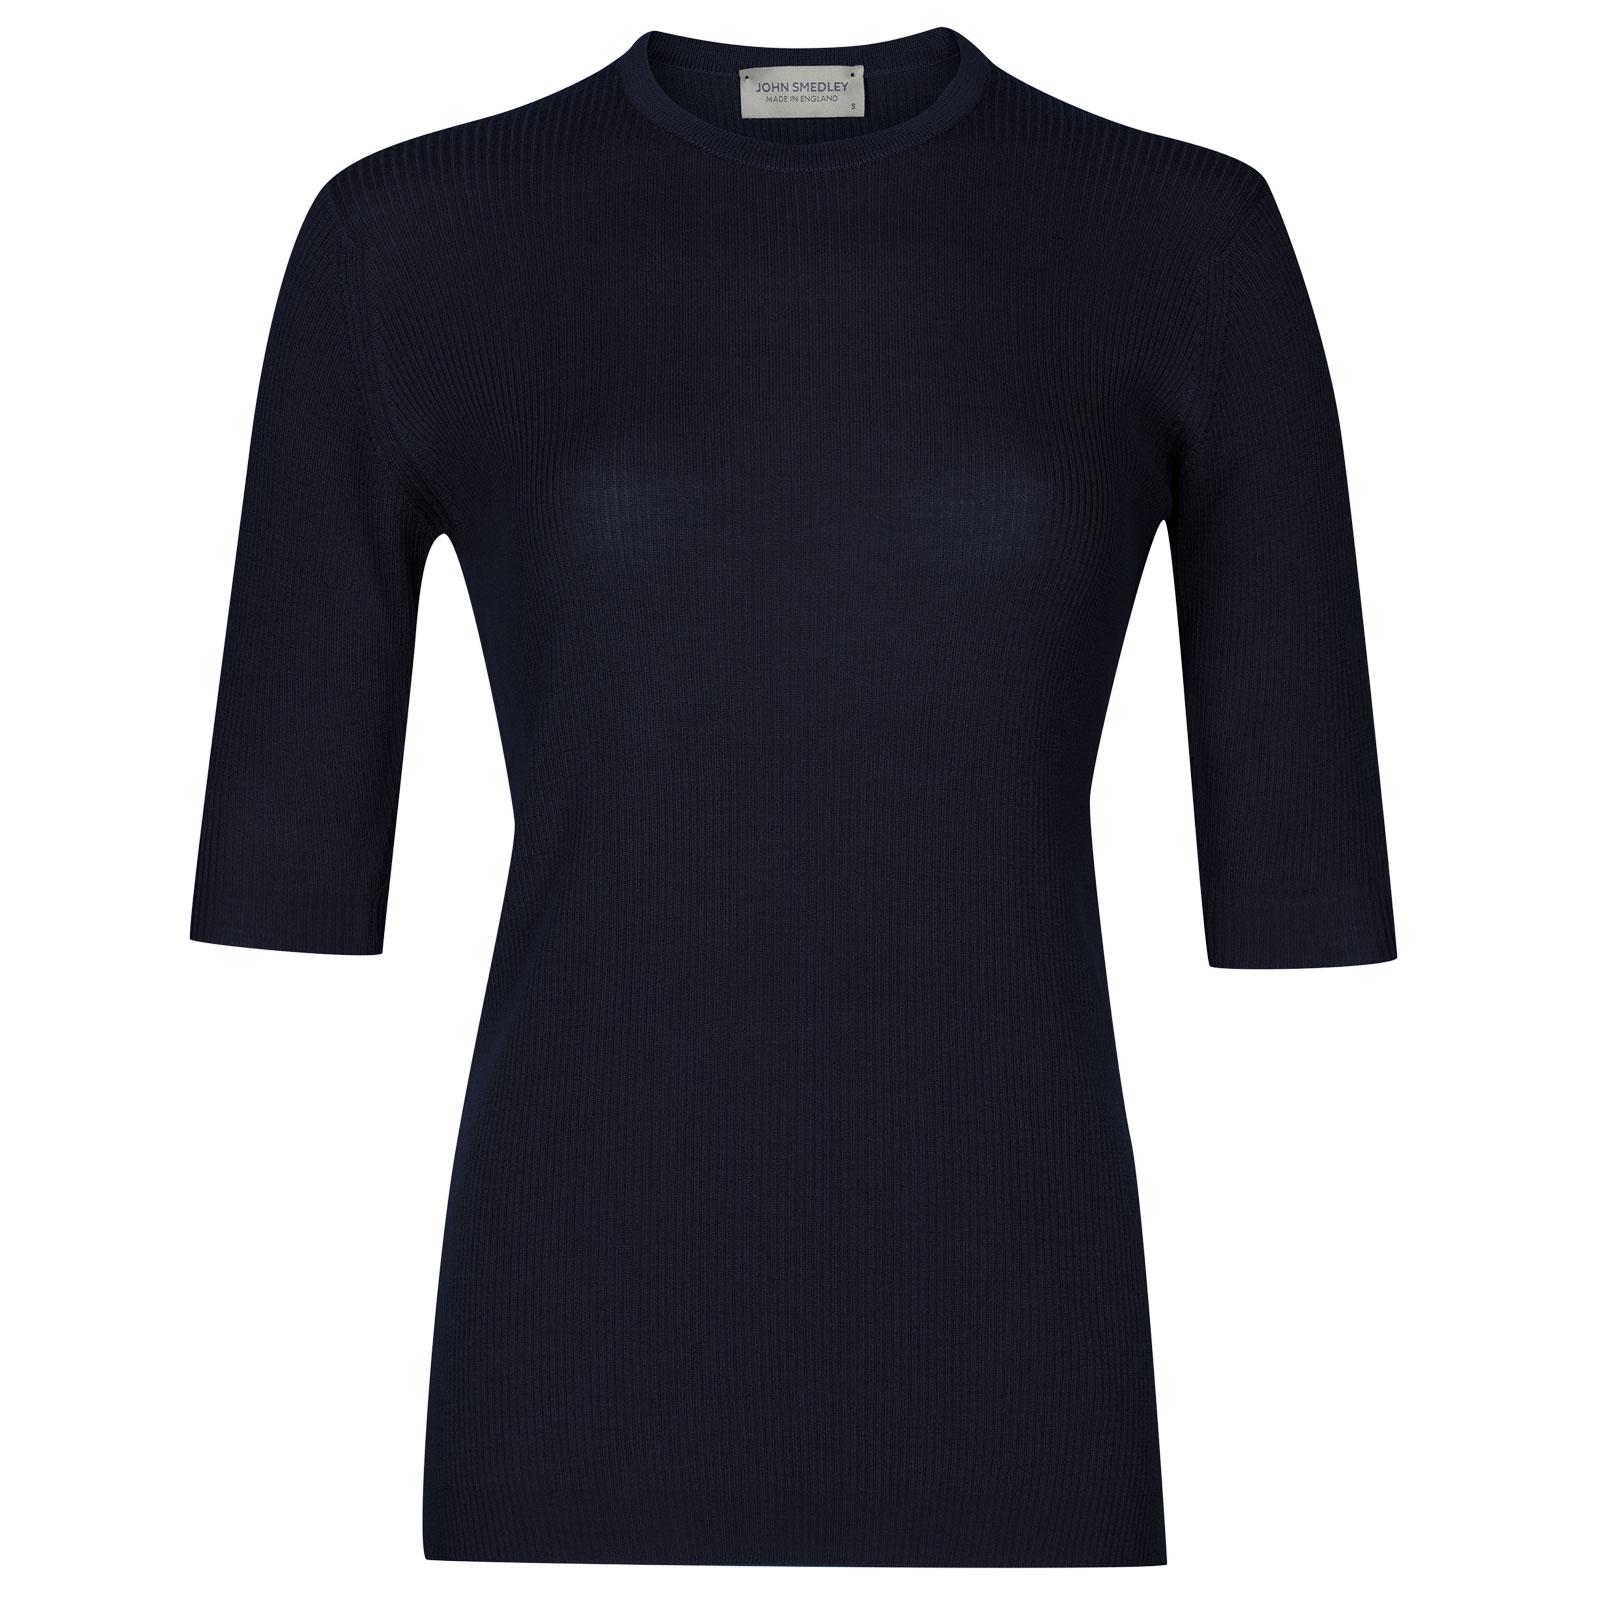 John Smedley wilis Merino Wool Sweater in Midnight-L